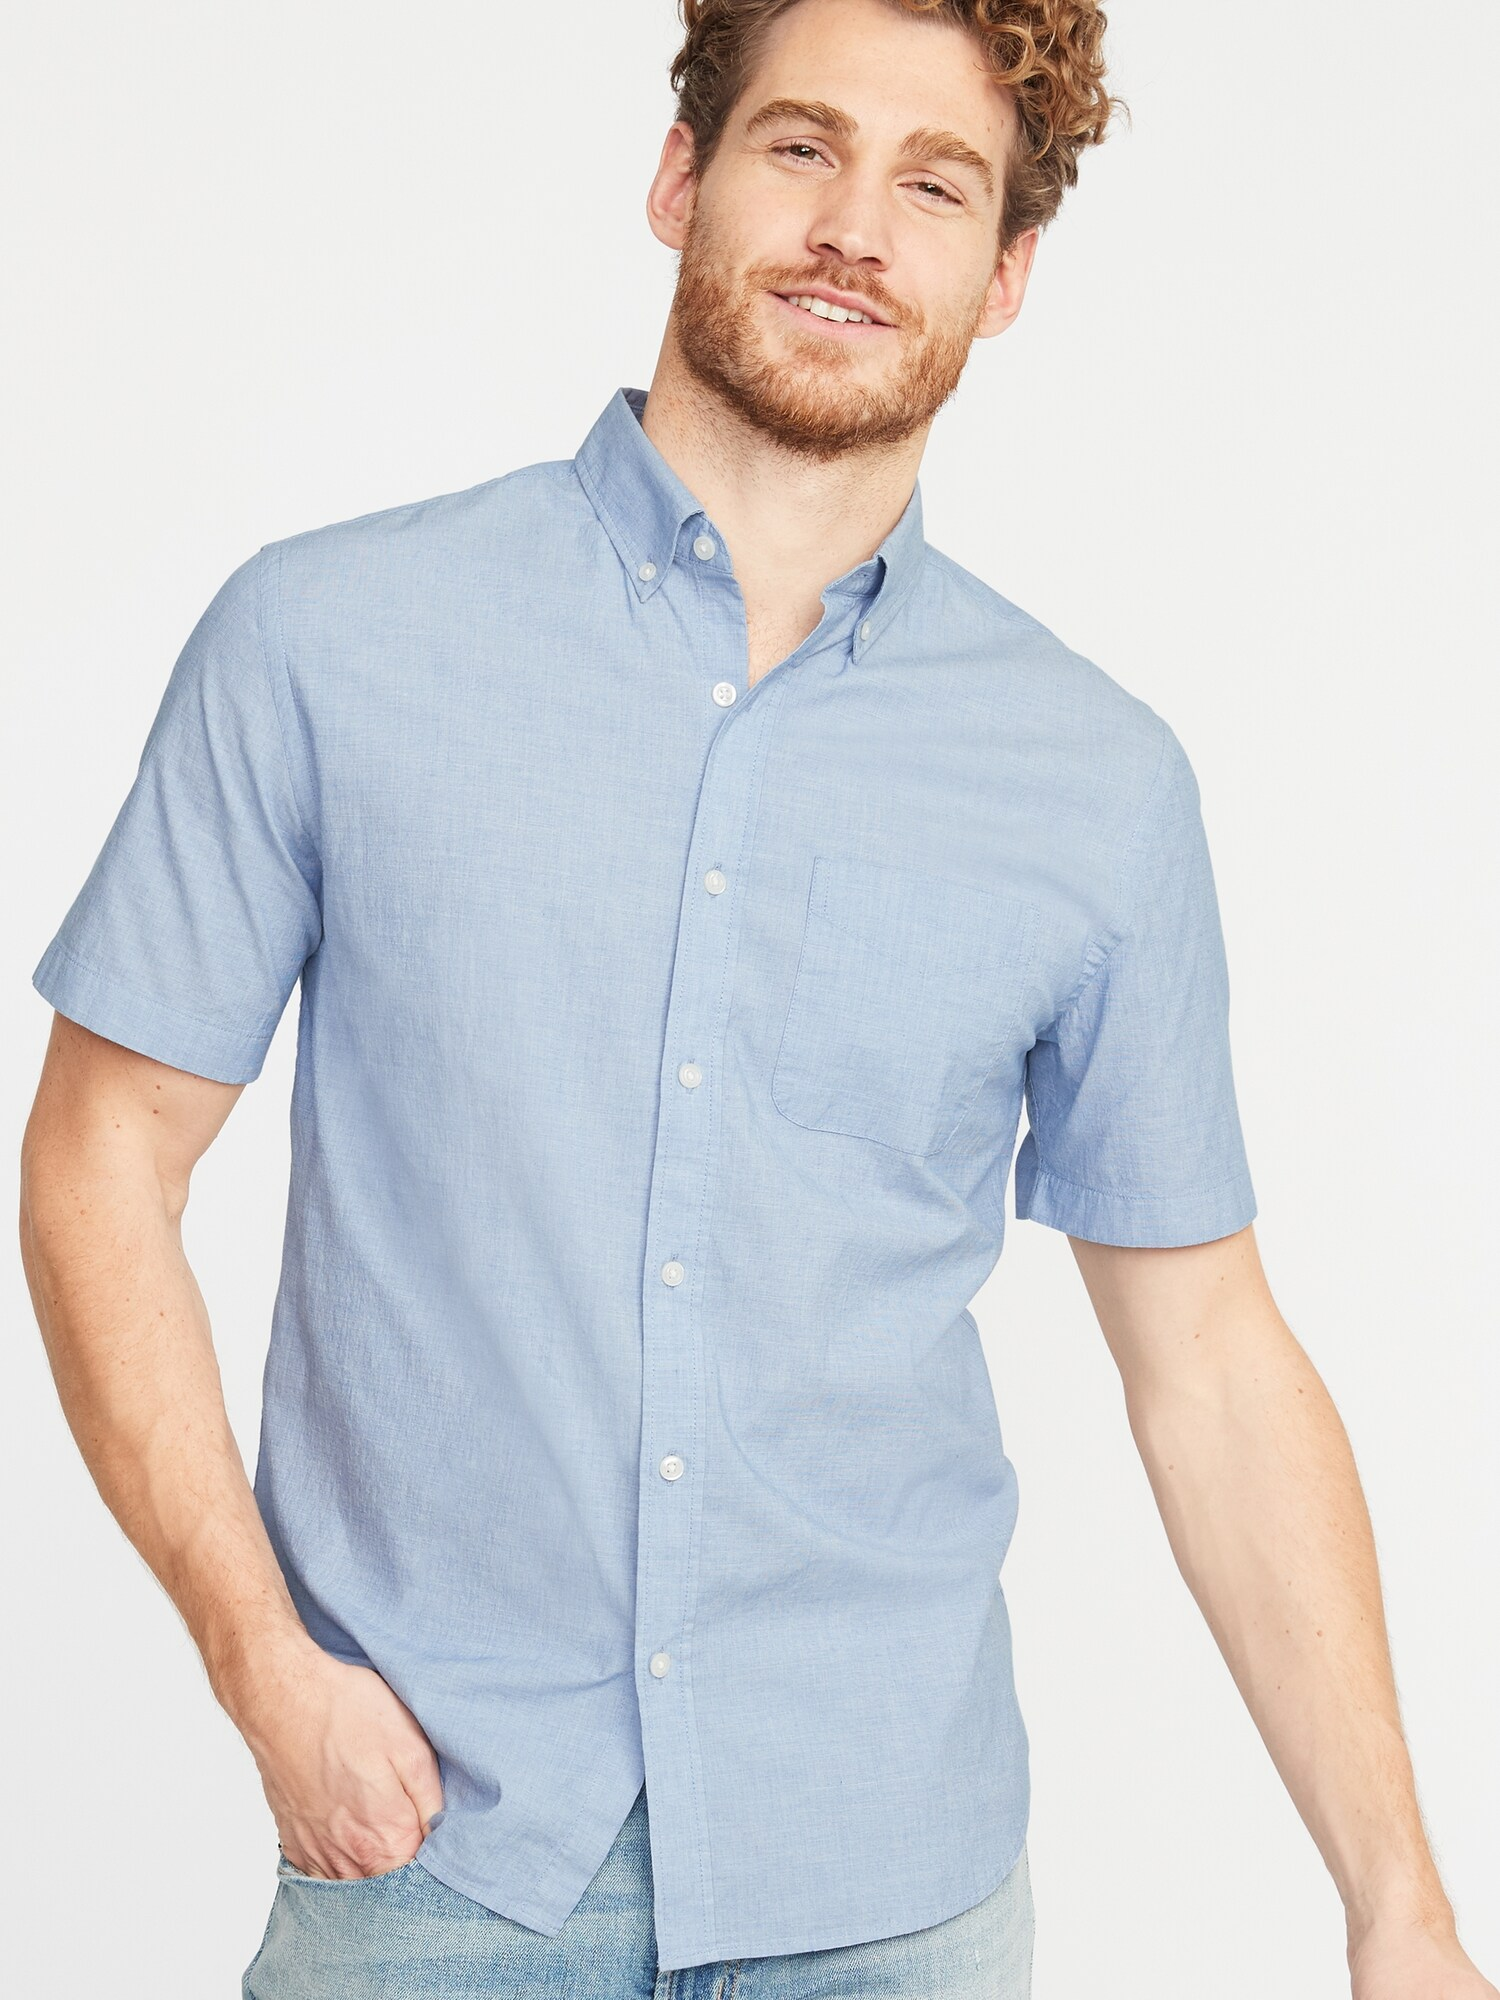 e016f774279 Slim-Fit Built-In Flex Everyday Shirt for Men